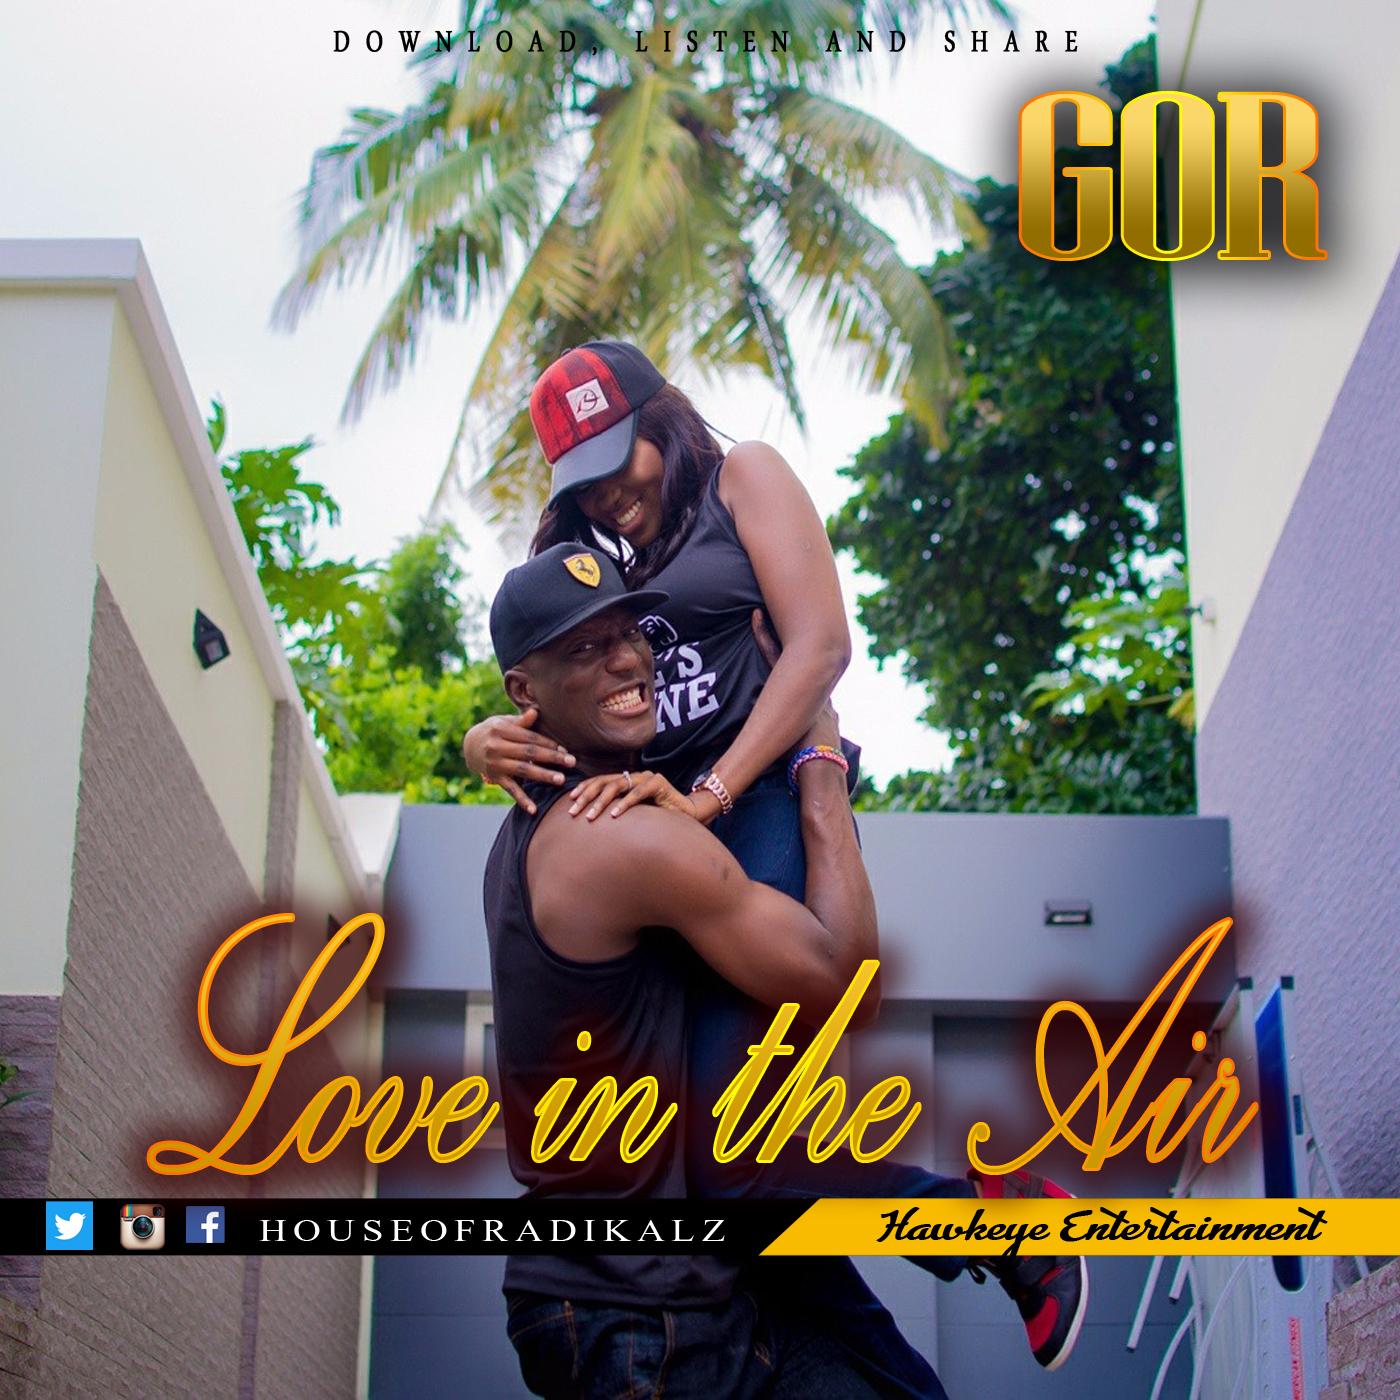 Love In The Air - GOR (5) [@houseofradikalz] - GospelNaija